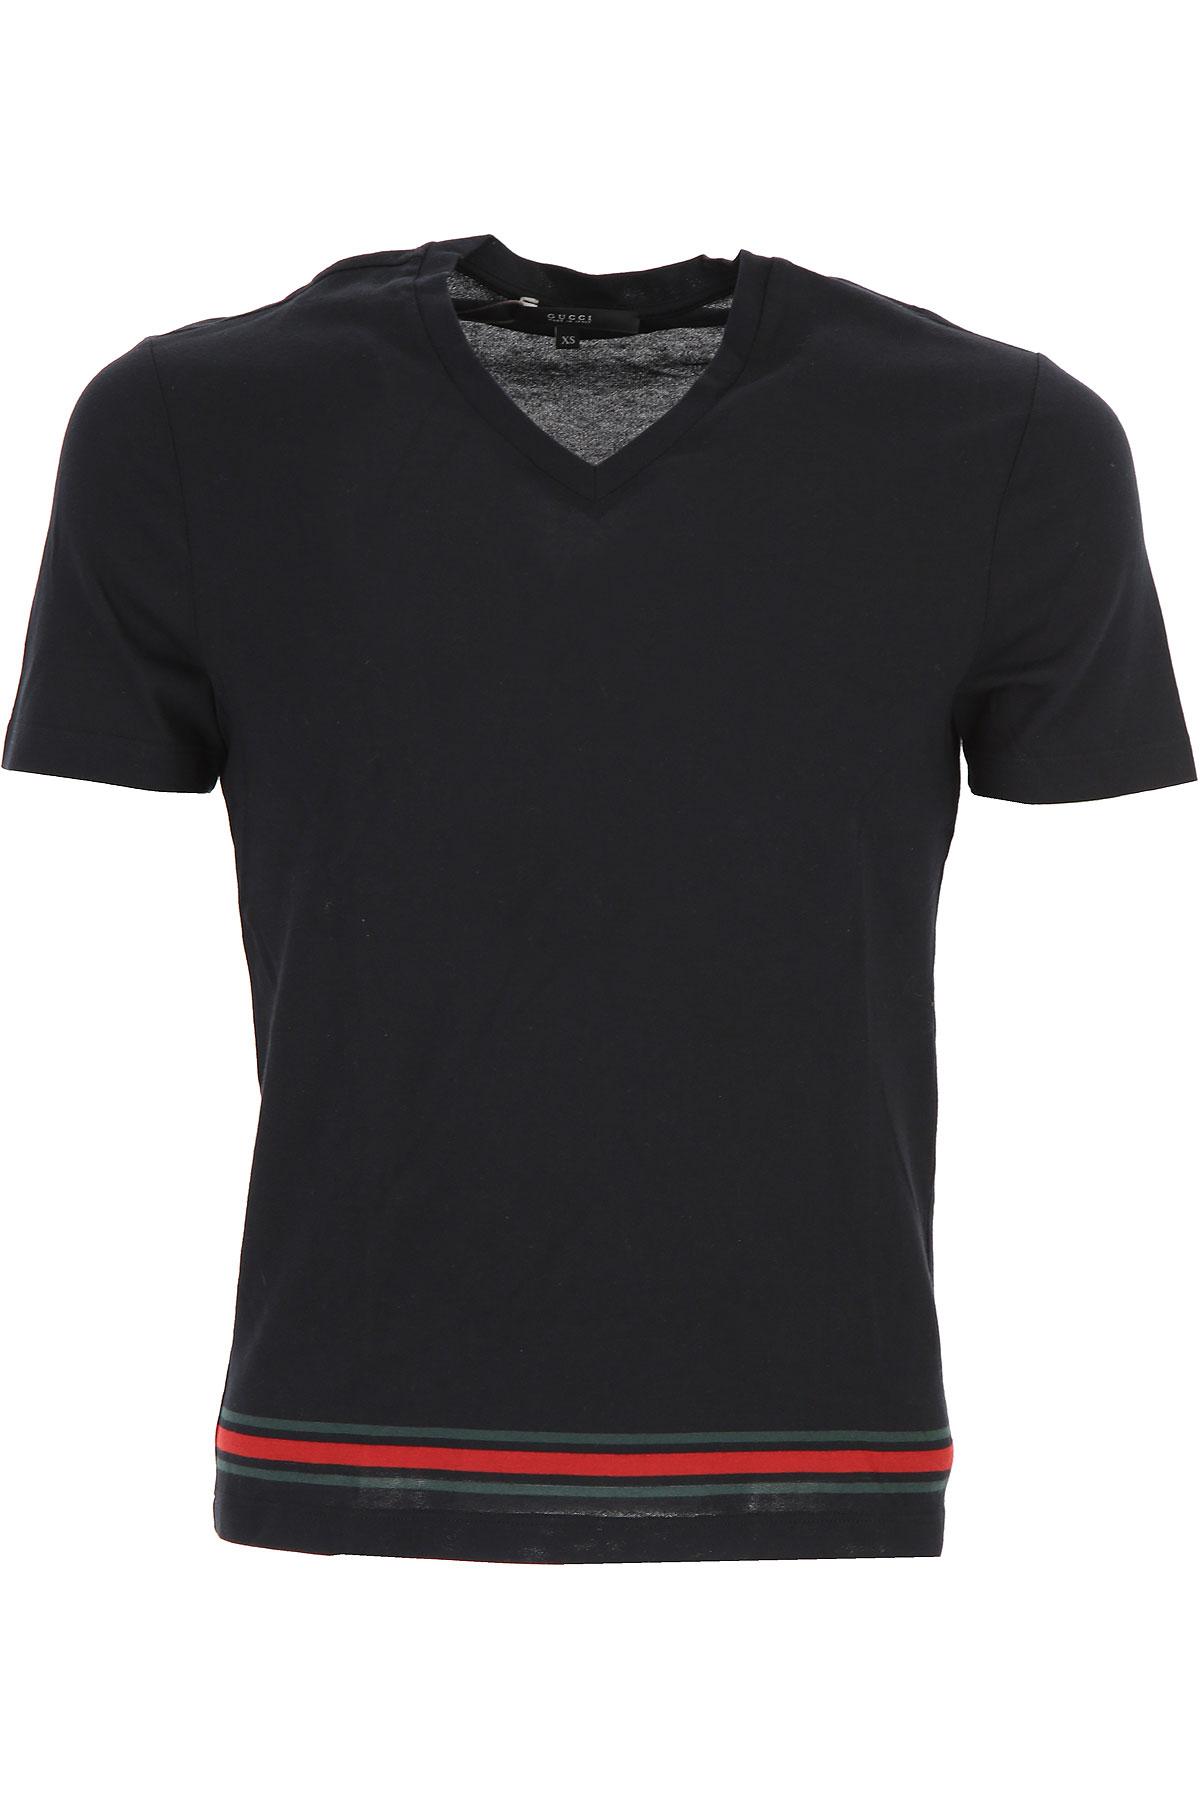 f907c6f1db6ec Gucci. Clothing for Men